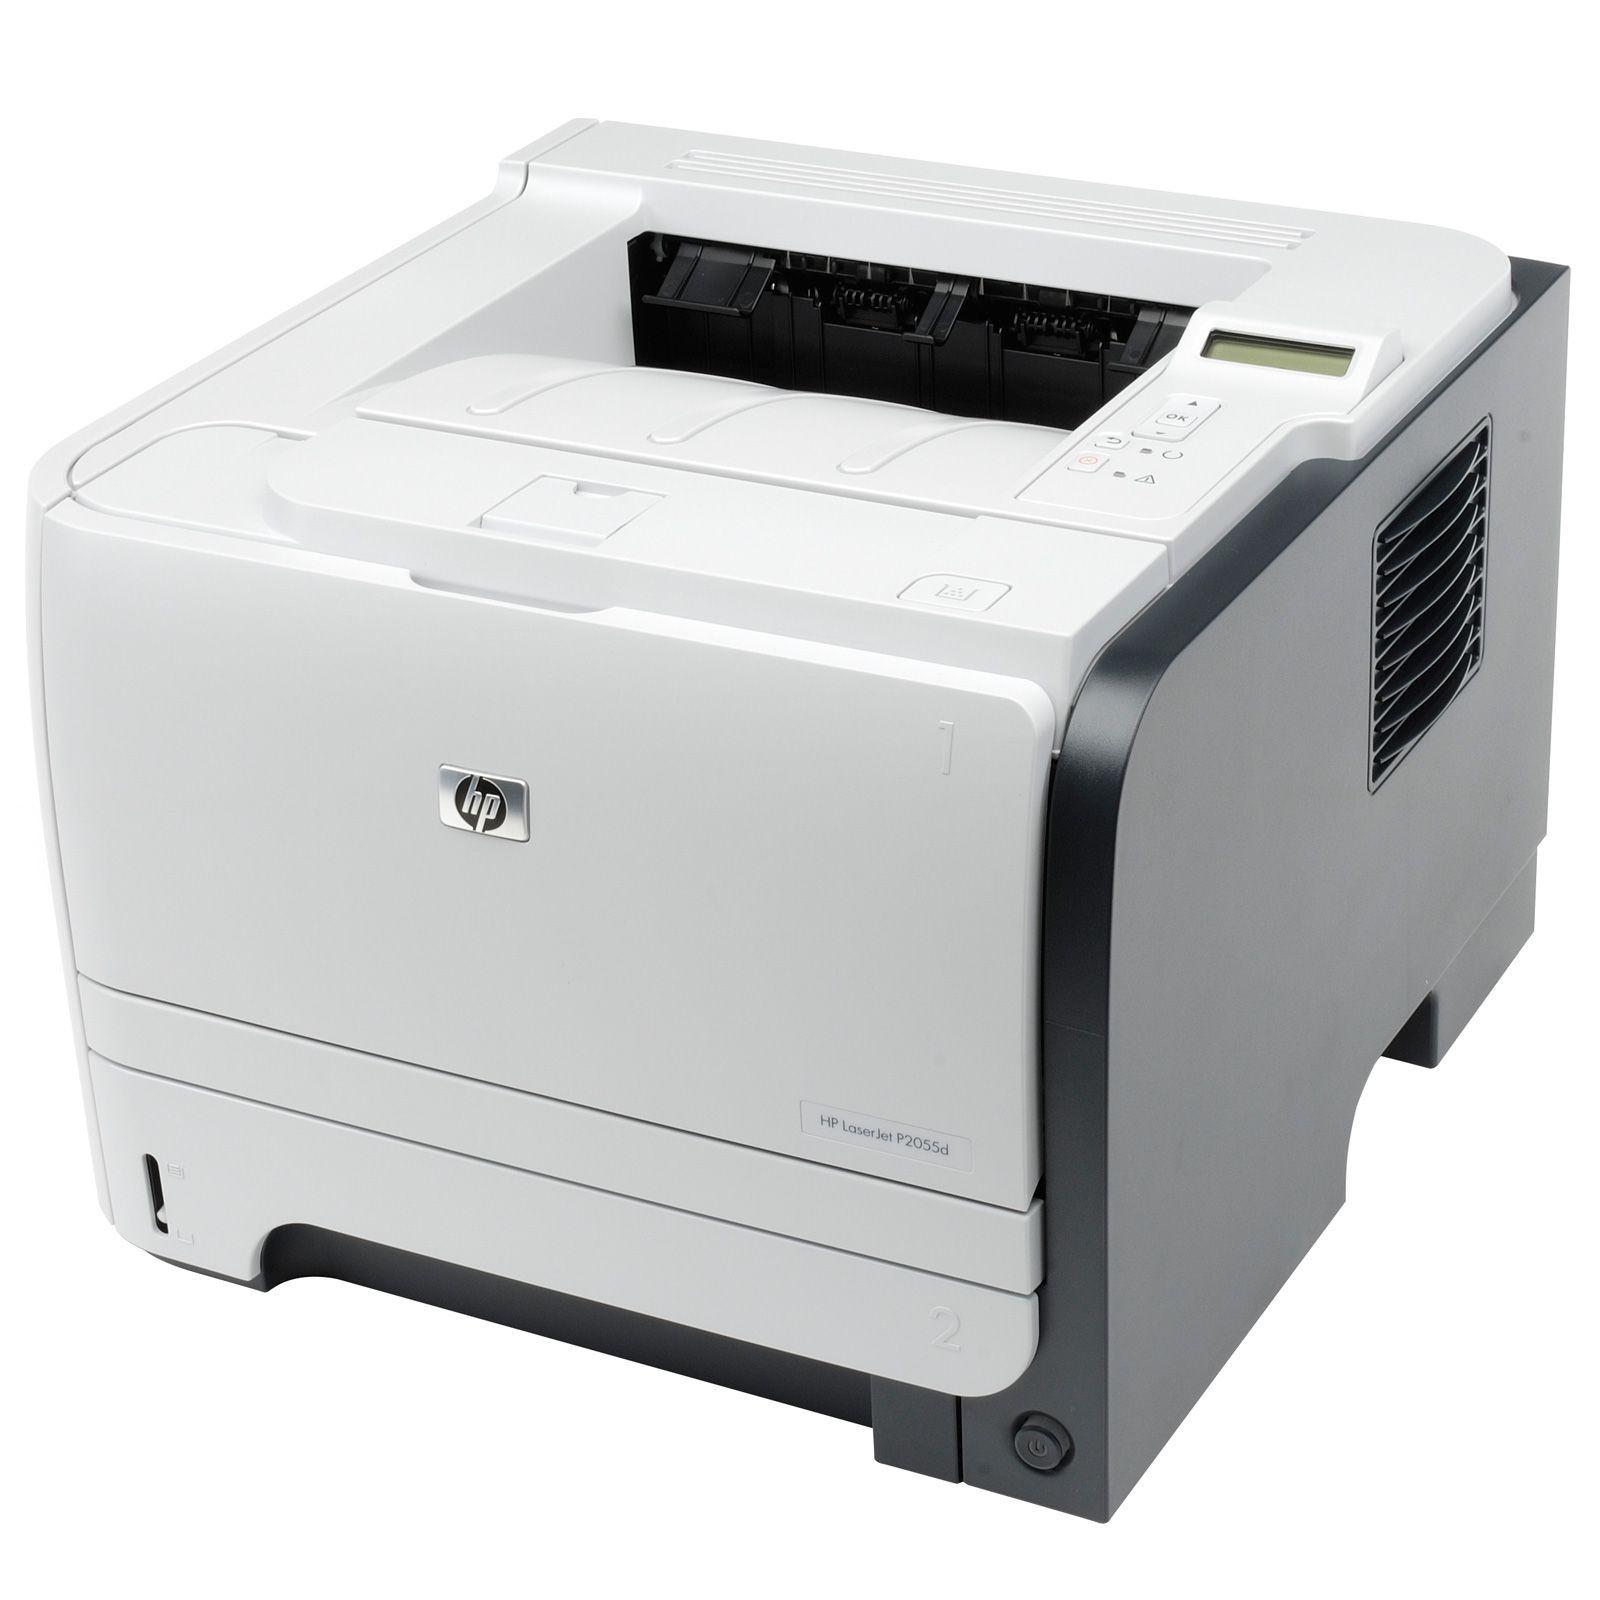 قیمت                      پرینتر لیزری اچ پی مدل p2055dn